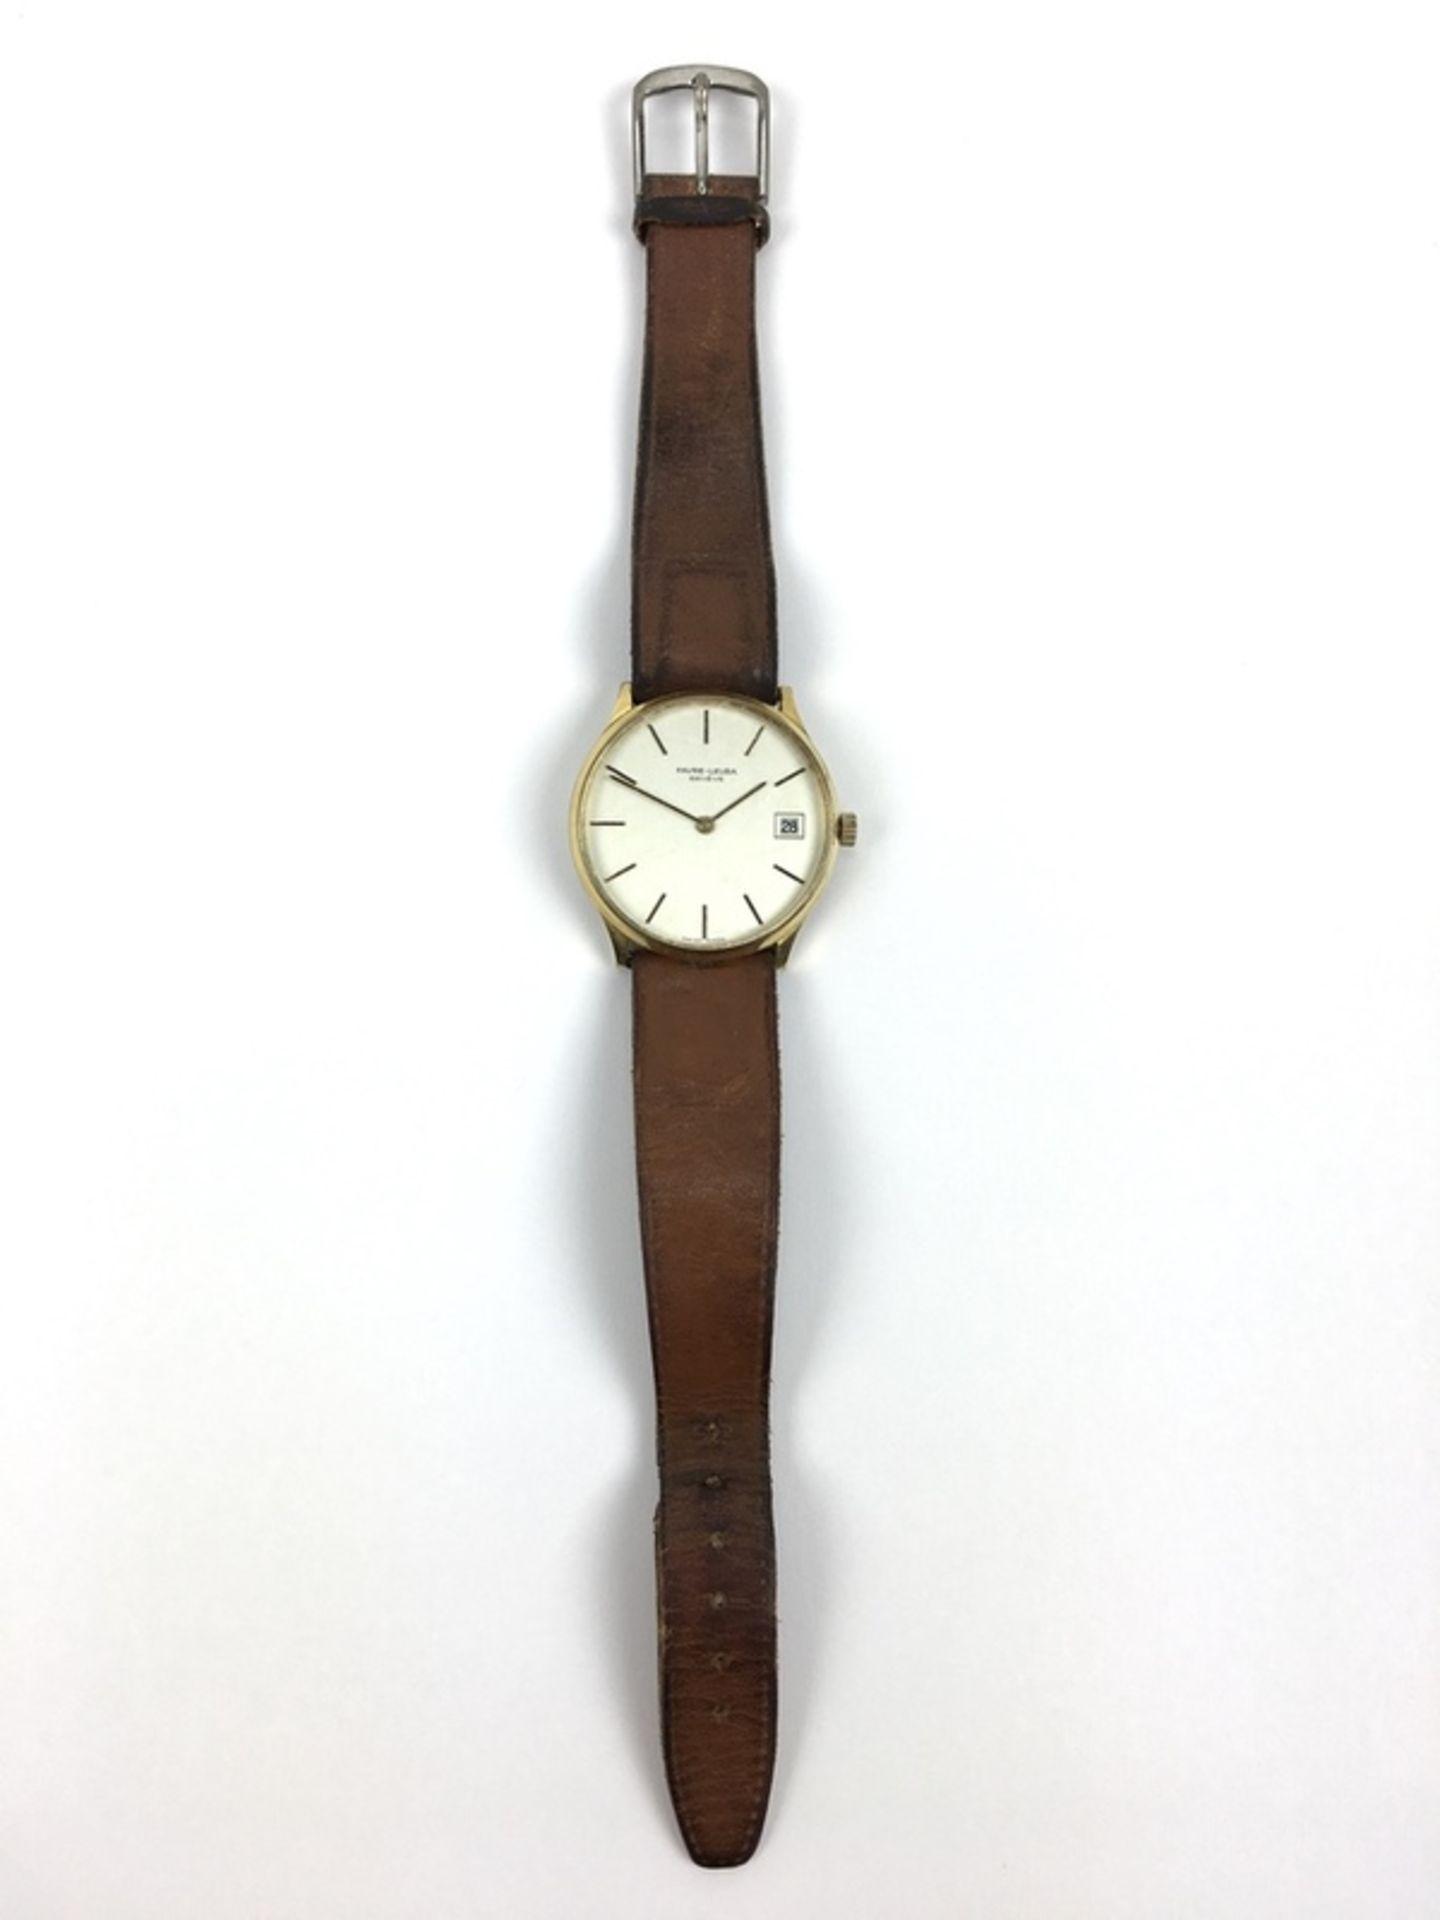 (Sieraden) Horloge Favre-Leuba GeneveVintage heren horloge Favre-Leuba Geneve. Conditie: In wer